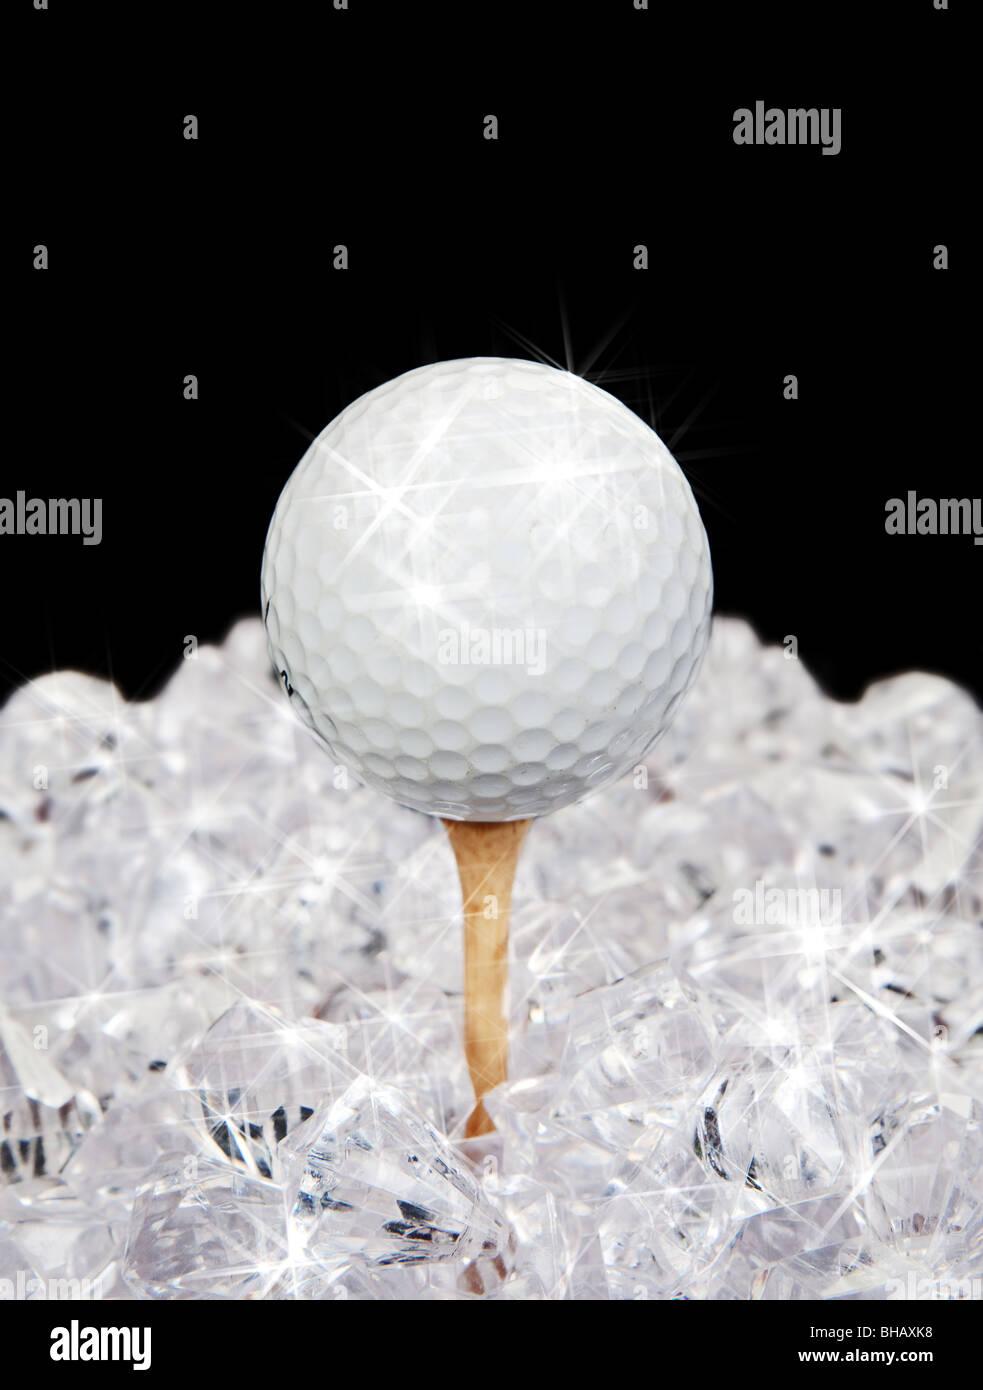 Ultimate golf ball on tee mousseux parmi les diamants Photo Stock